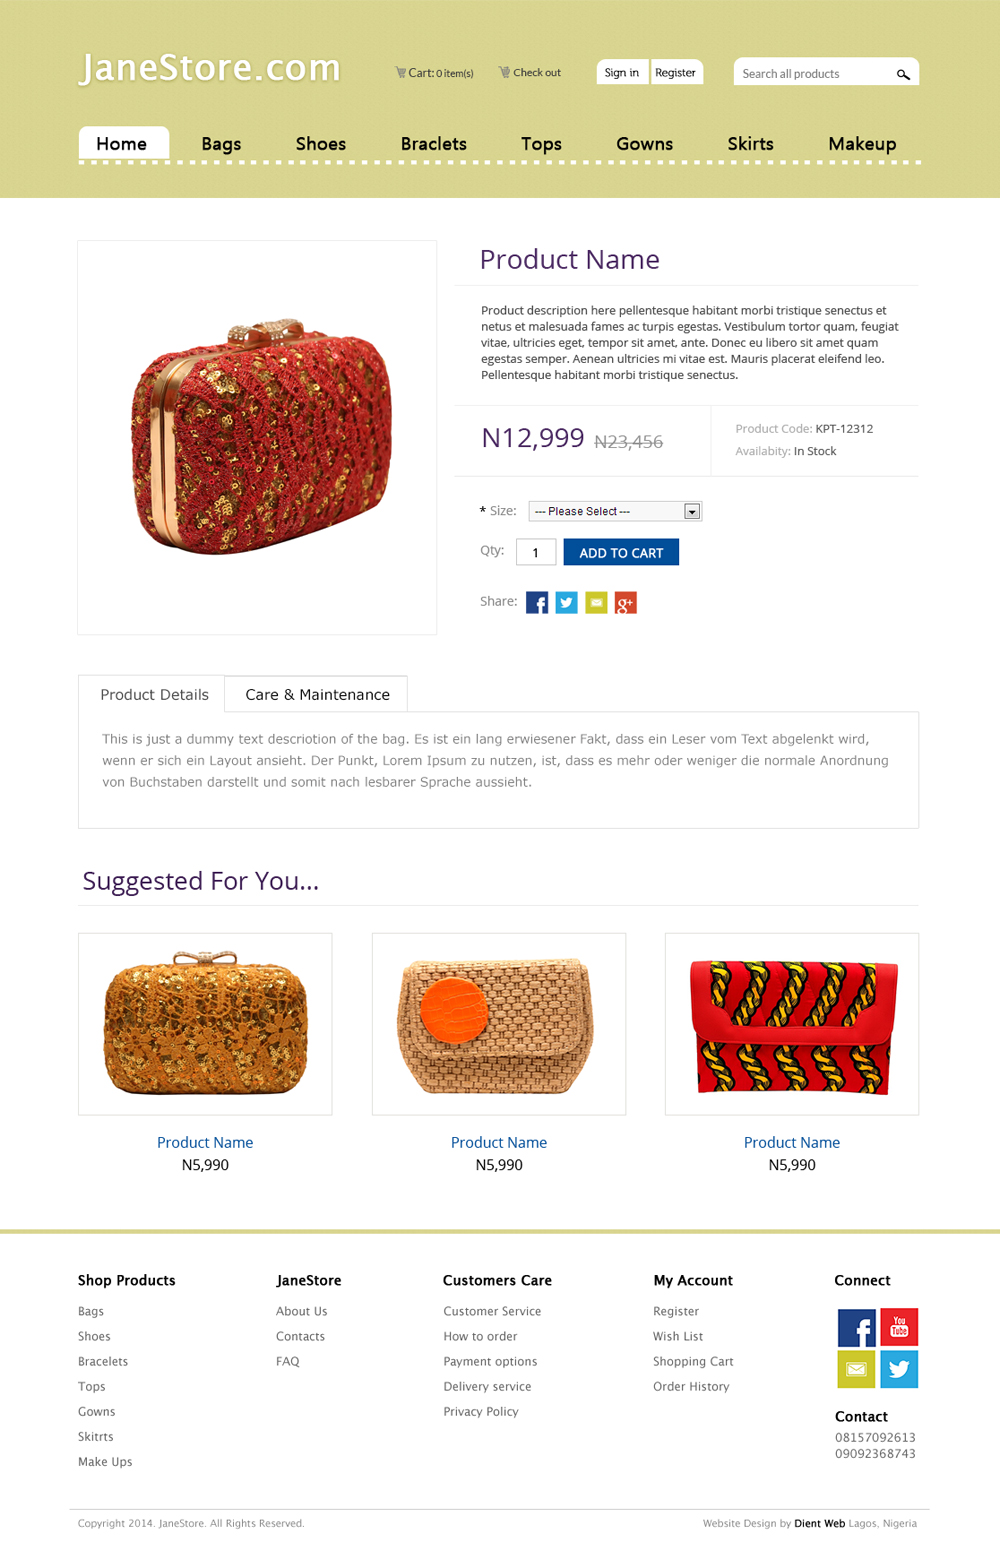 ecommerce website design by DientWeb Janestore product page design